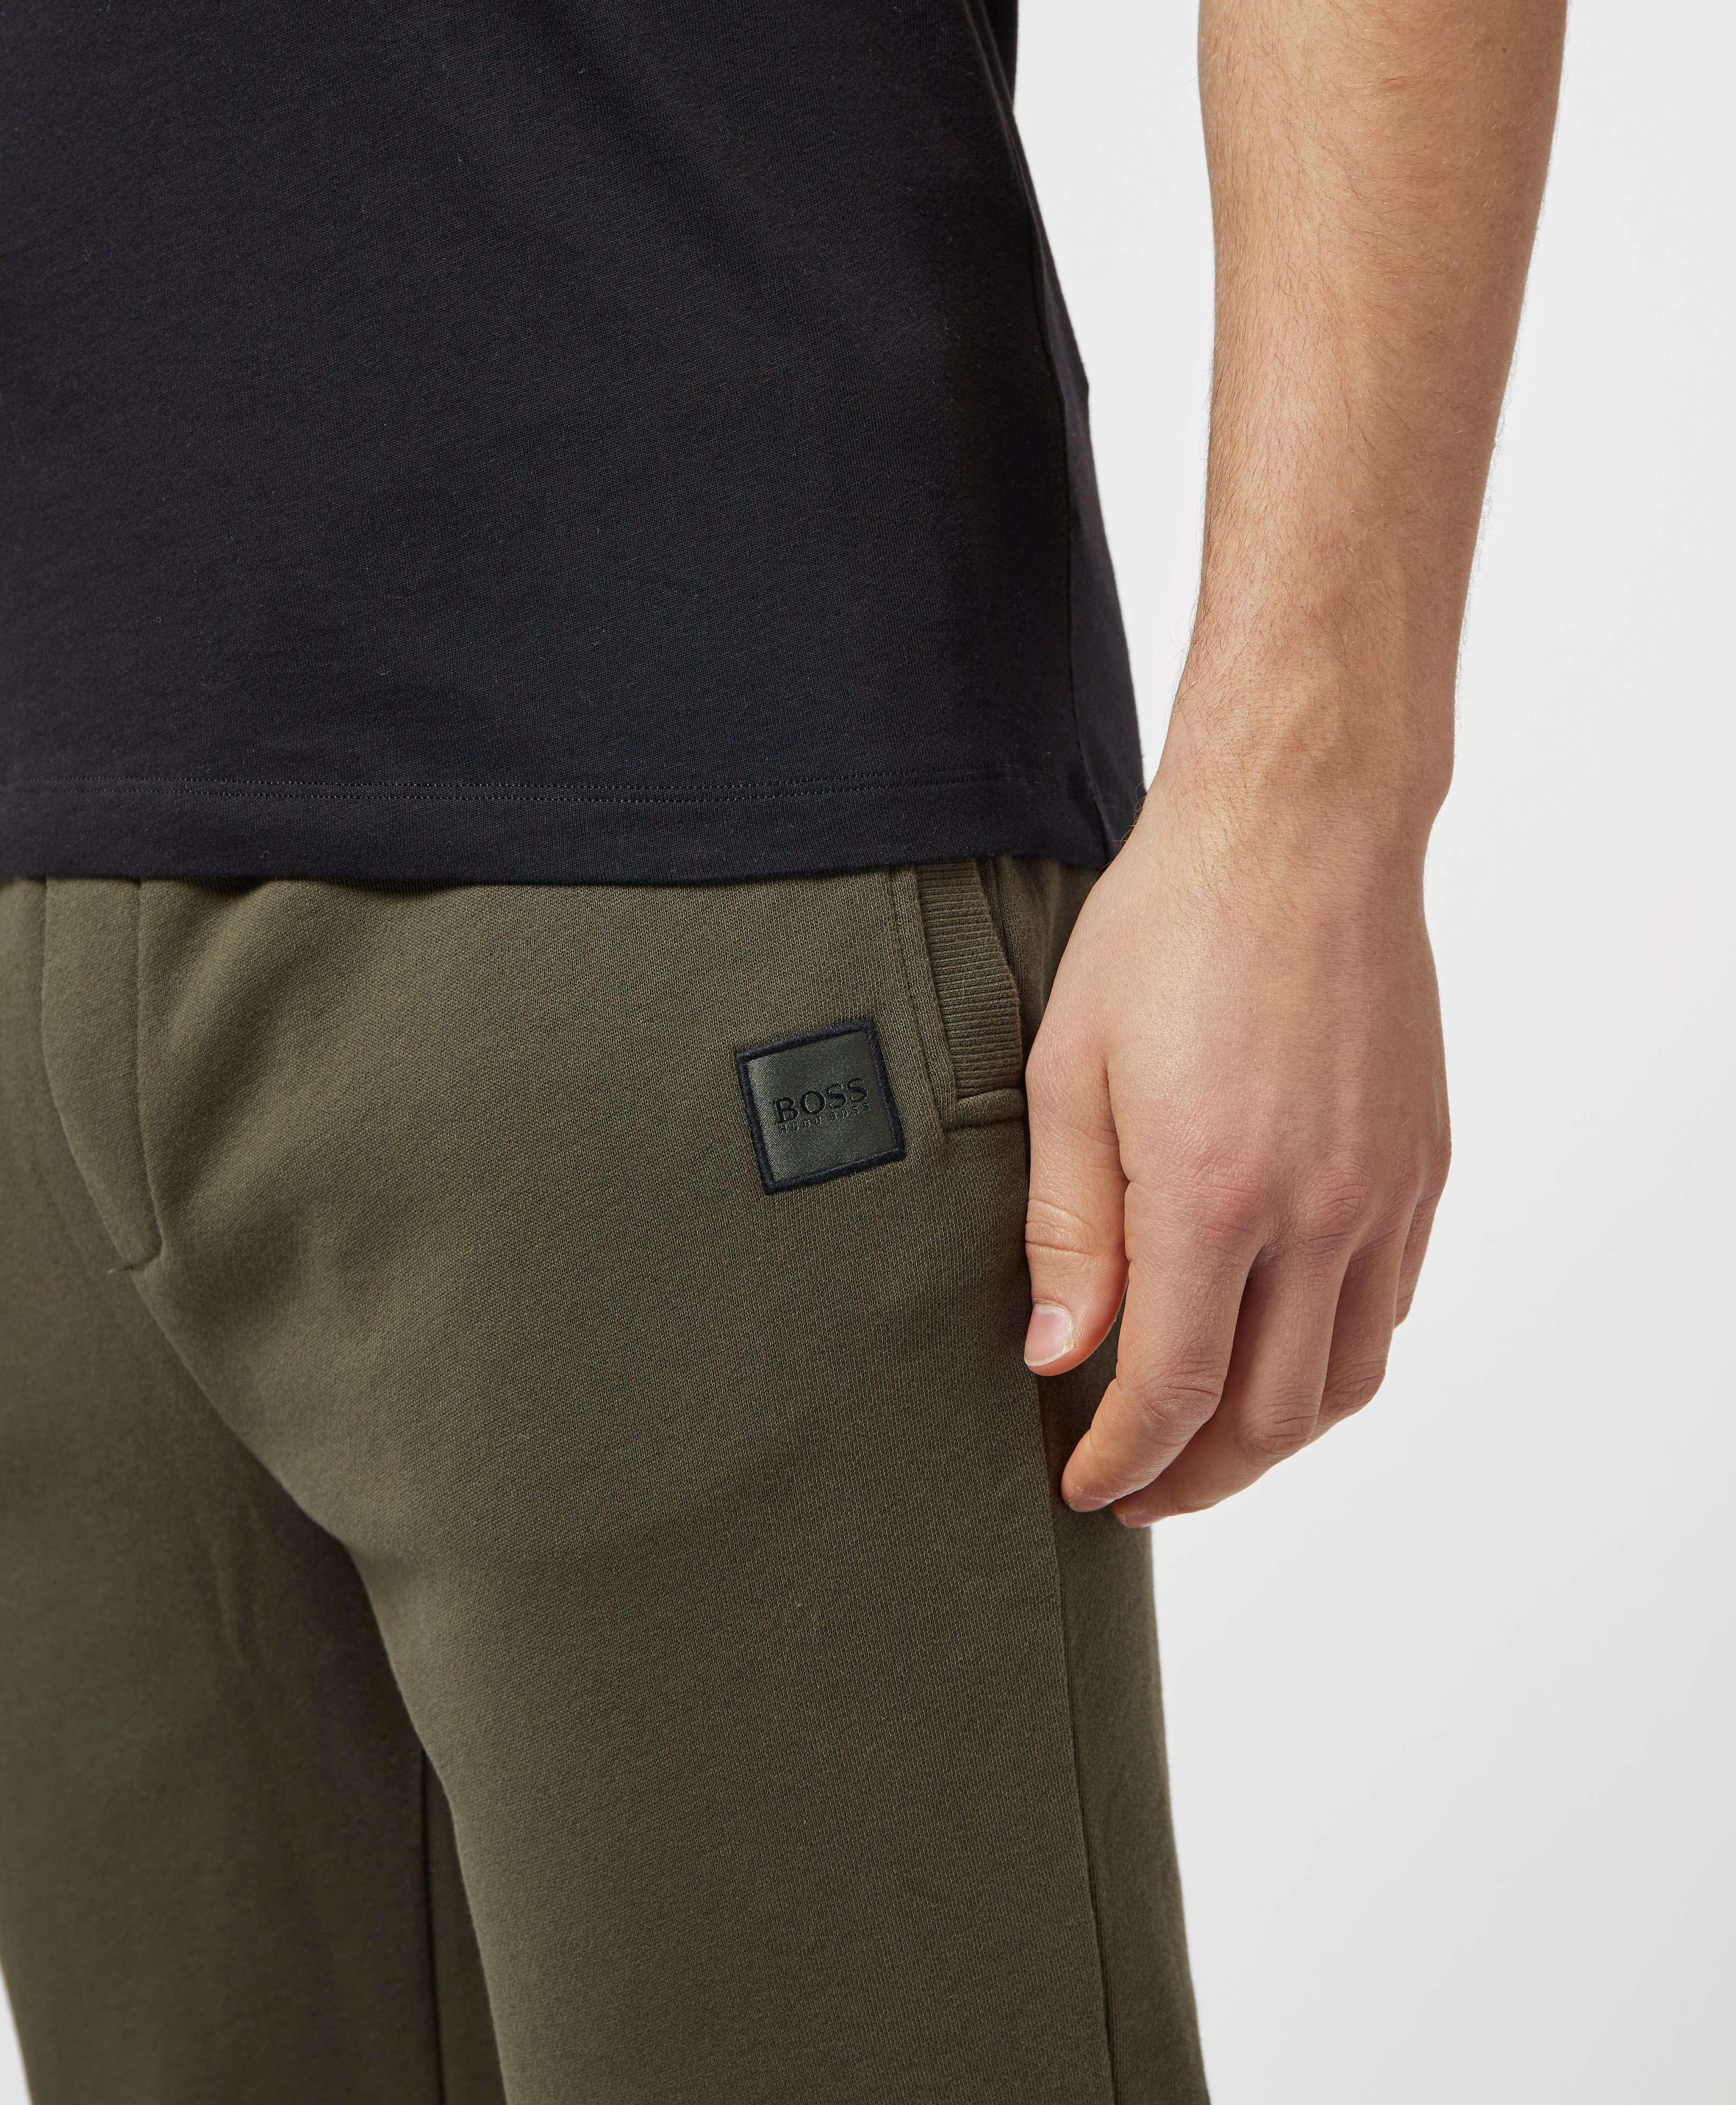 BOSS Striker Cuffed Track Pants